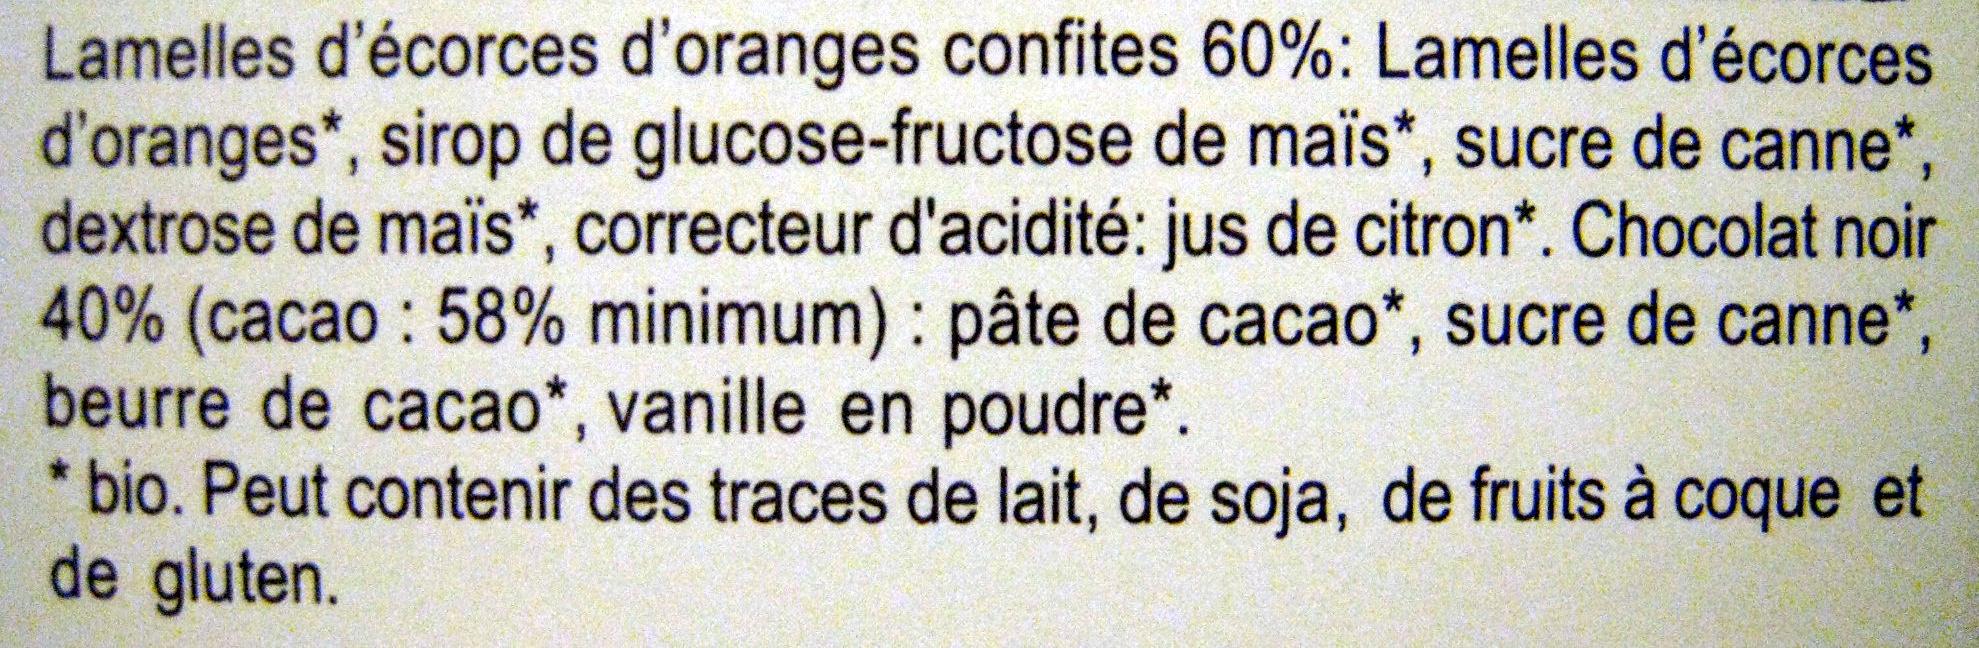 Orangettes Chocolat noir - Ingredients